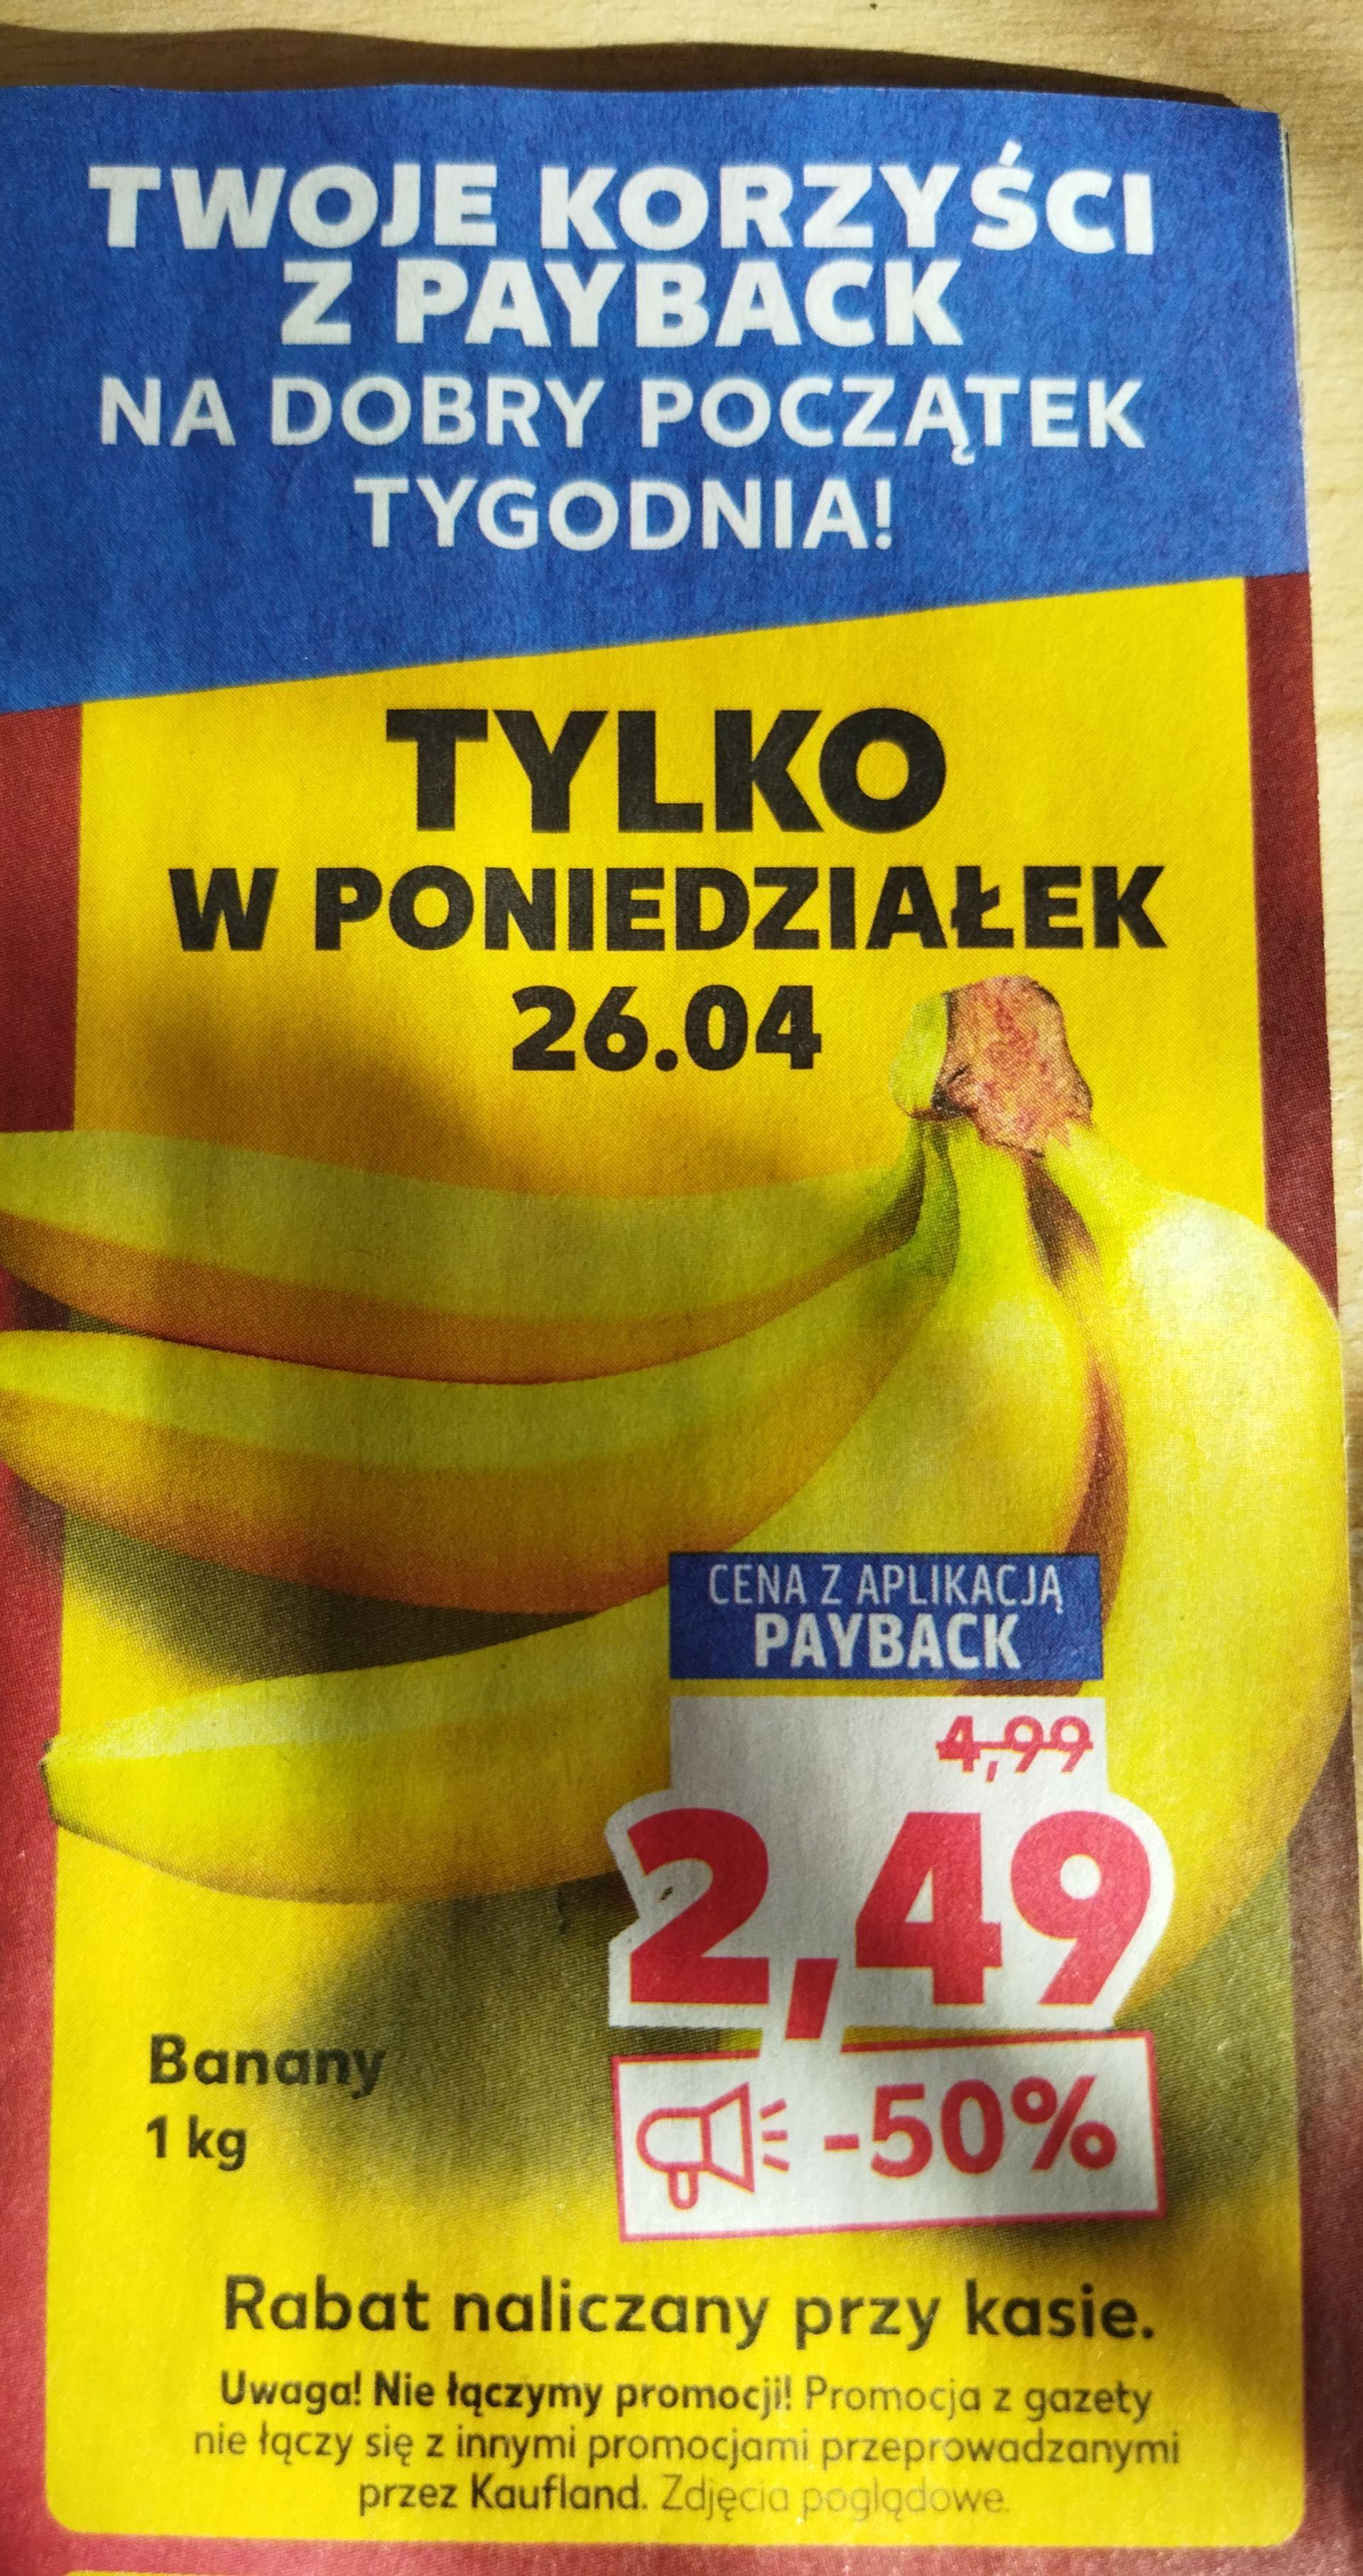 Banany z kartą Payback - Kaufland